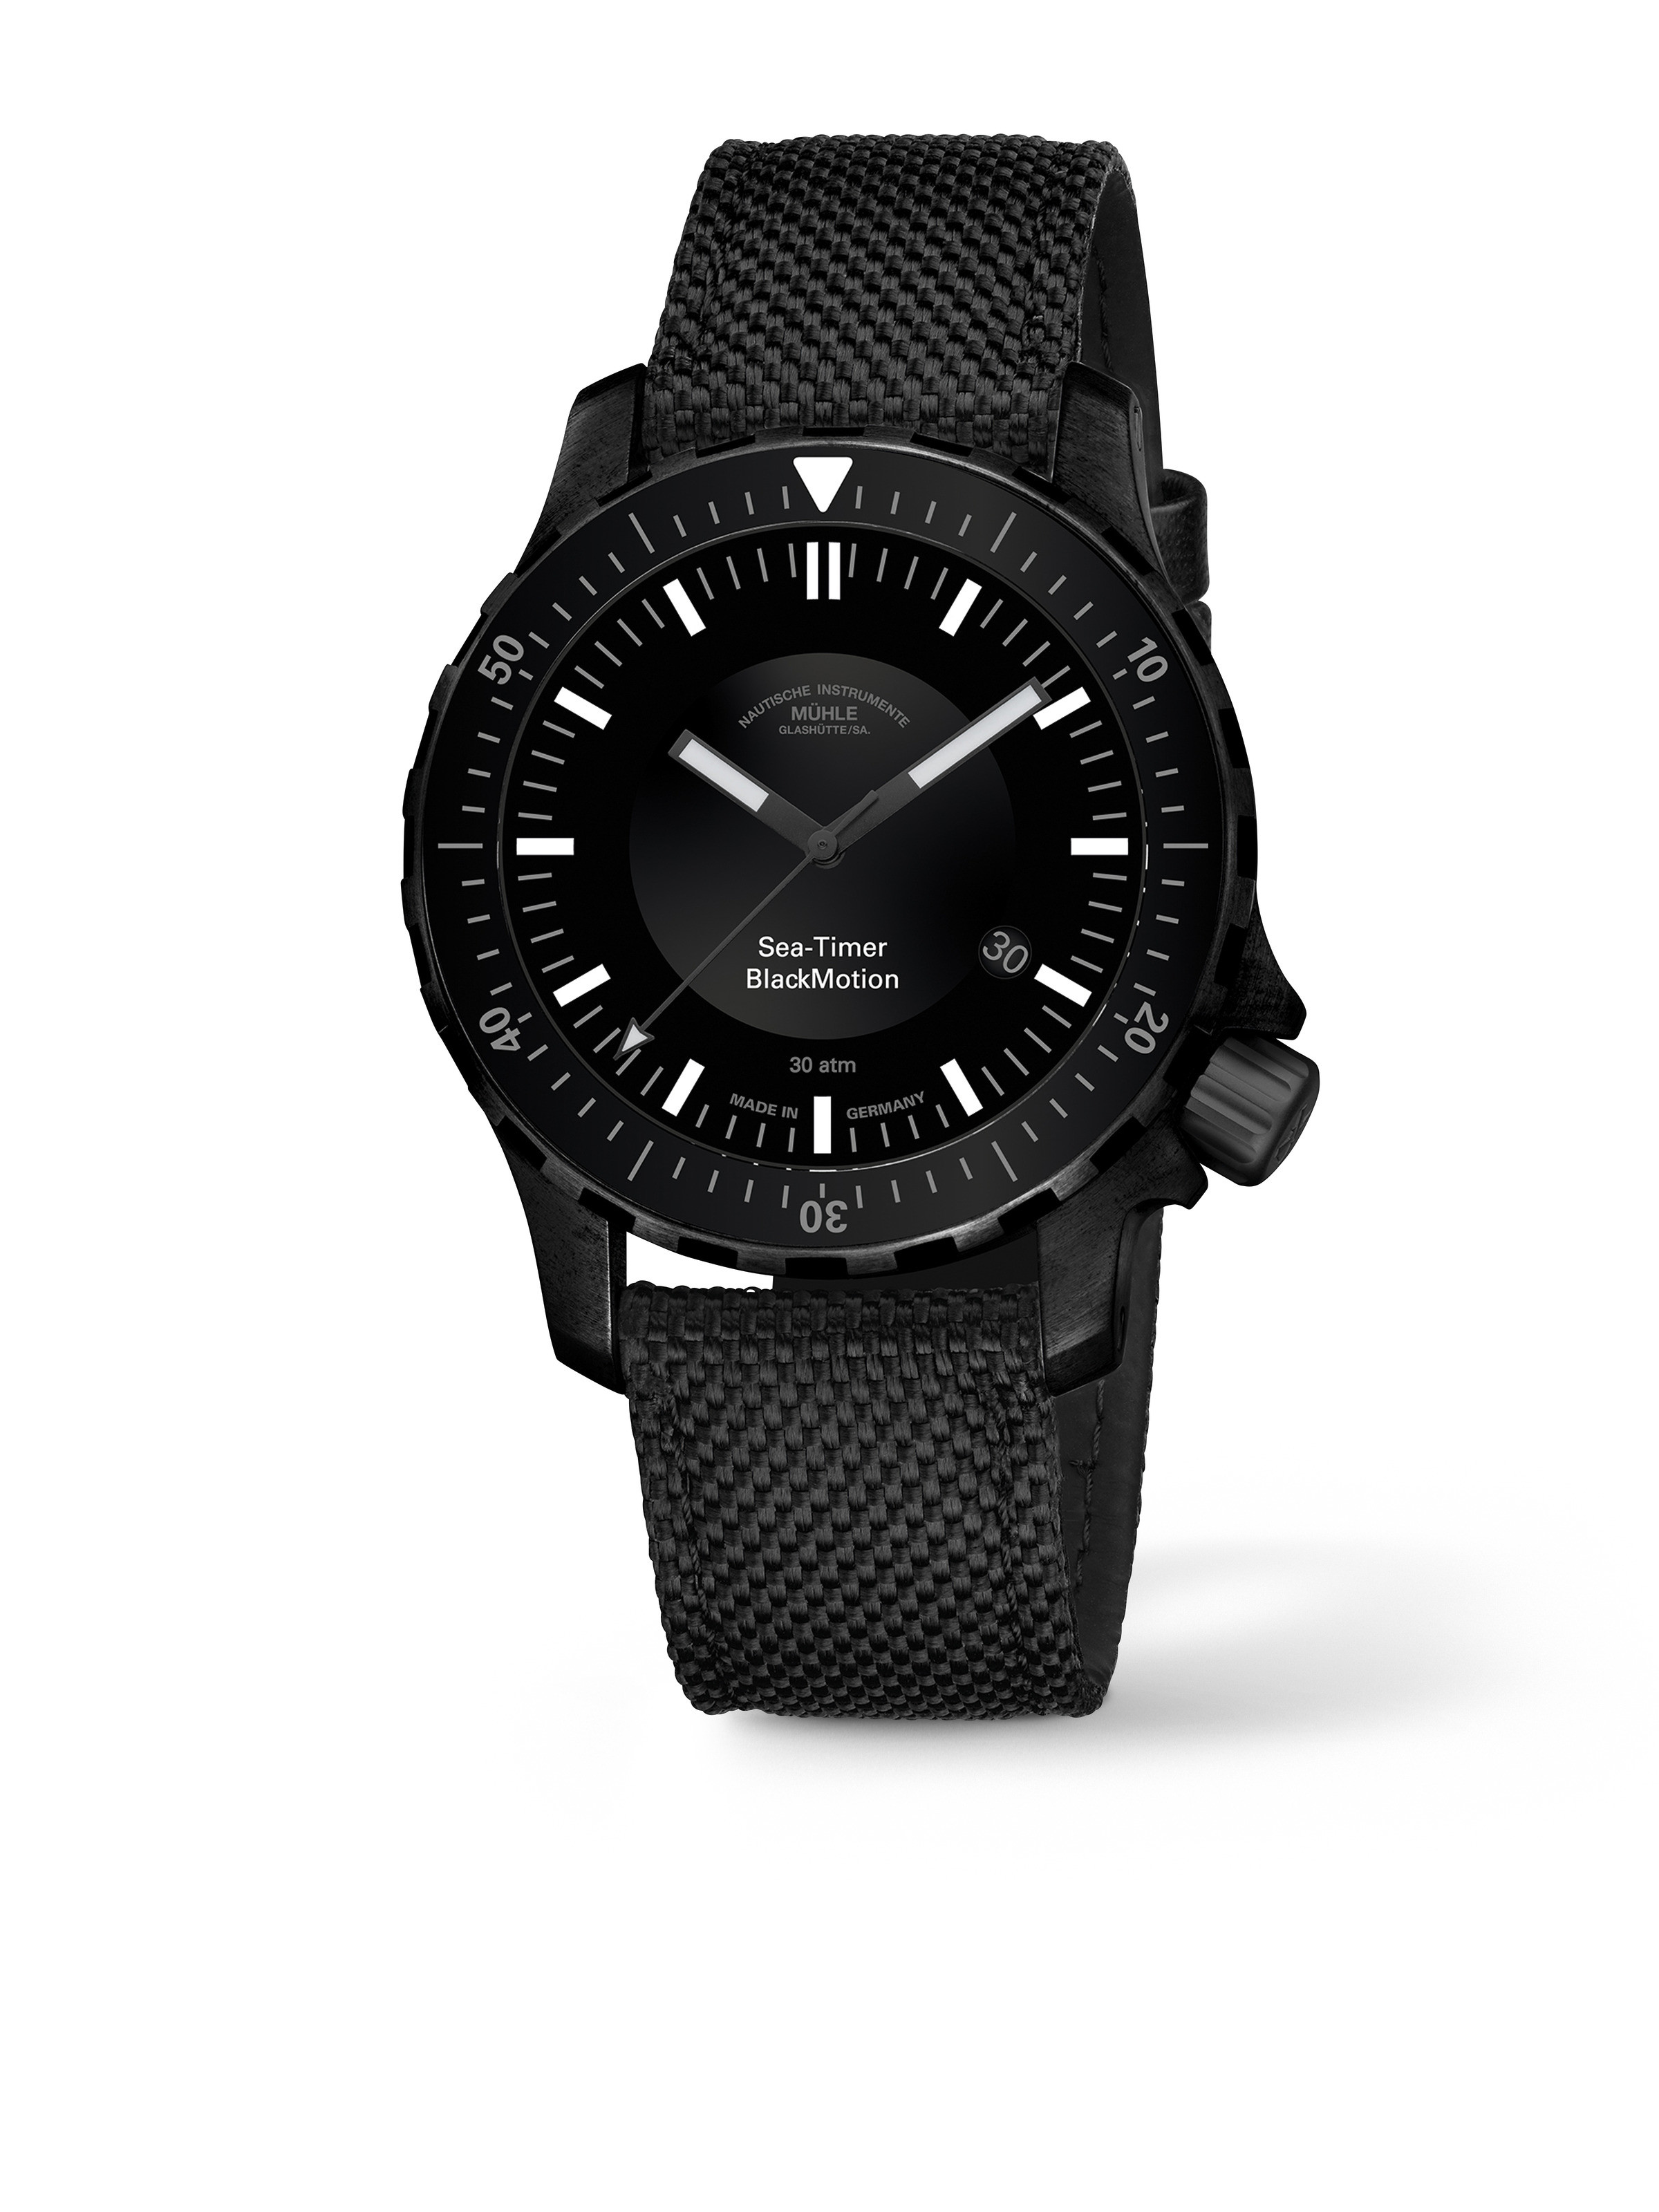 Sea-Timer BlackMotion